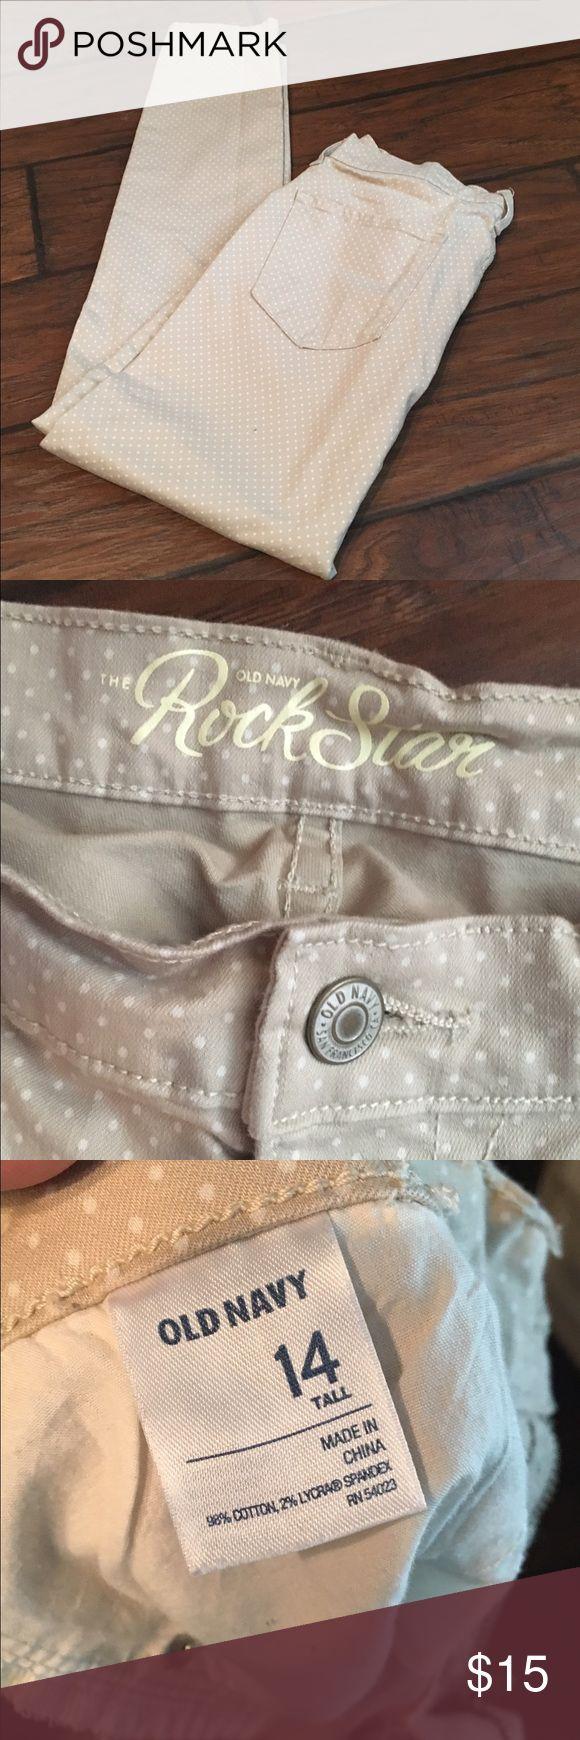 Old Navy RockStar Poka Dot Khaki Skinny Jeans Old Navy RockStar Poka Dot Khaki Skinny Jeans. Size 14/tall. Never Worn :( Old Navy Jeans Skinny